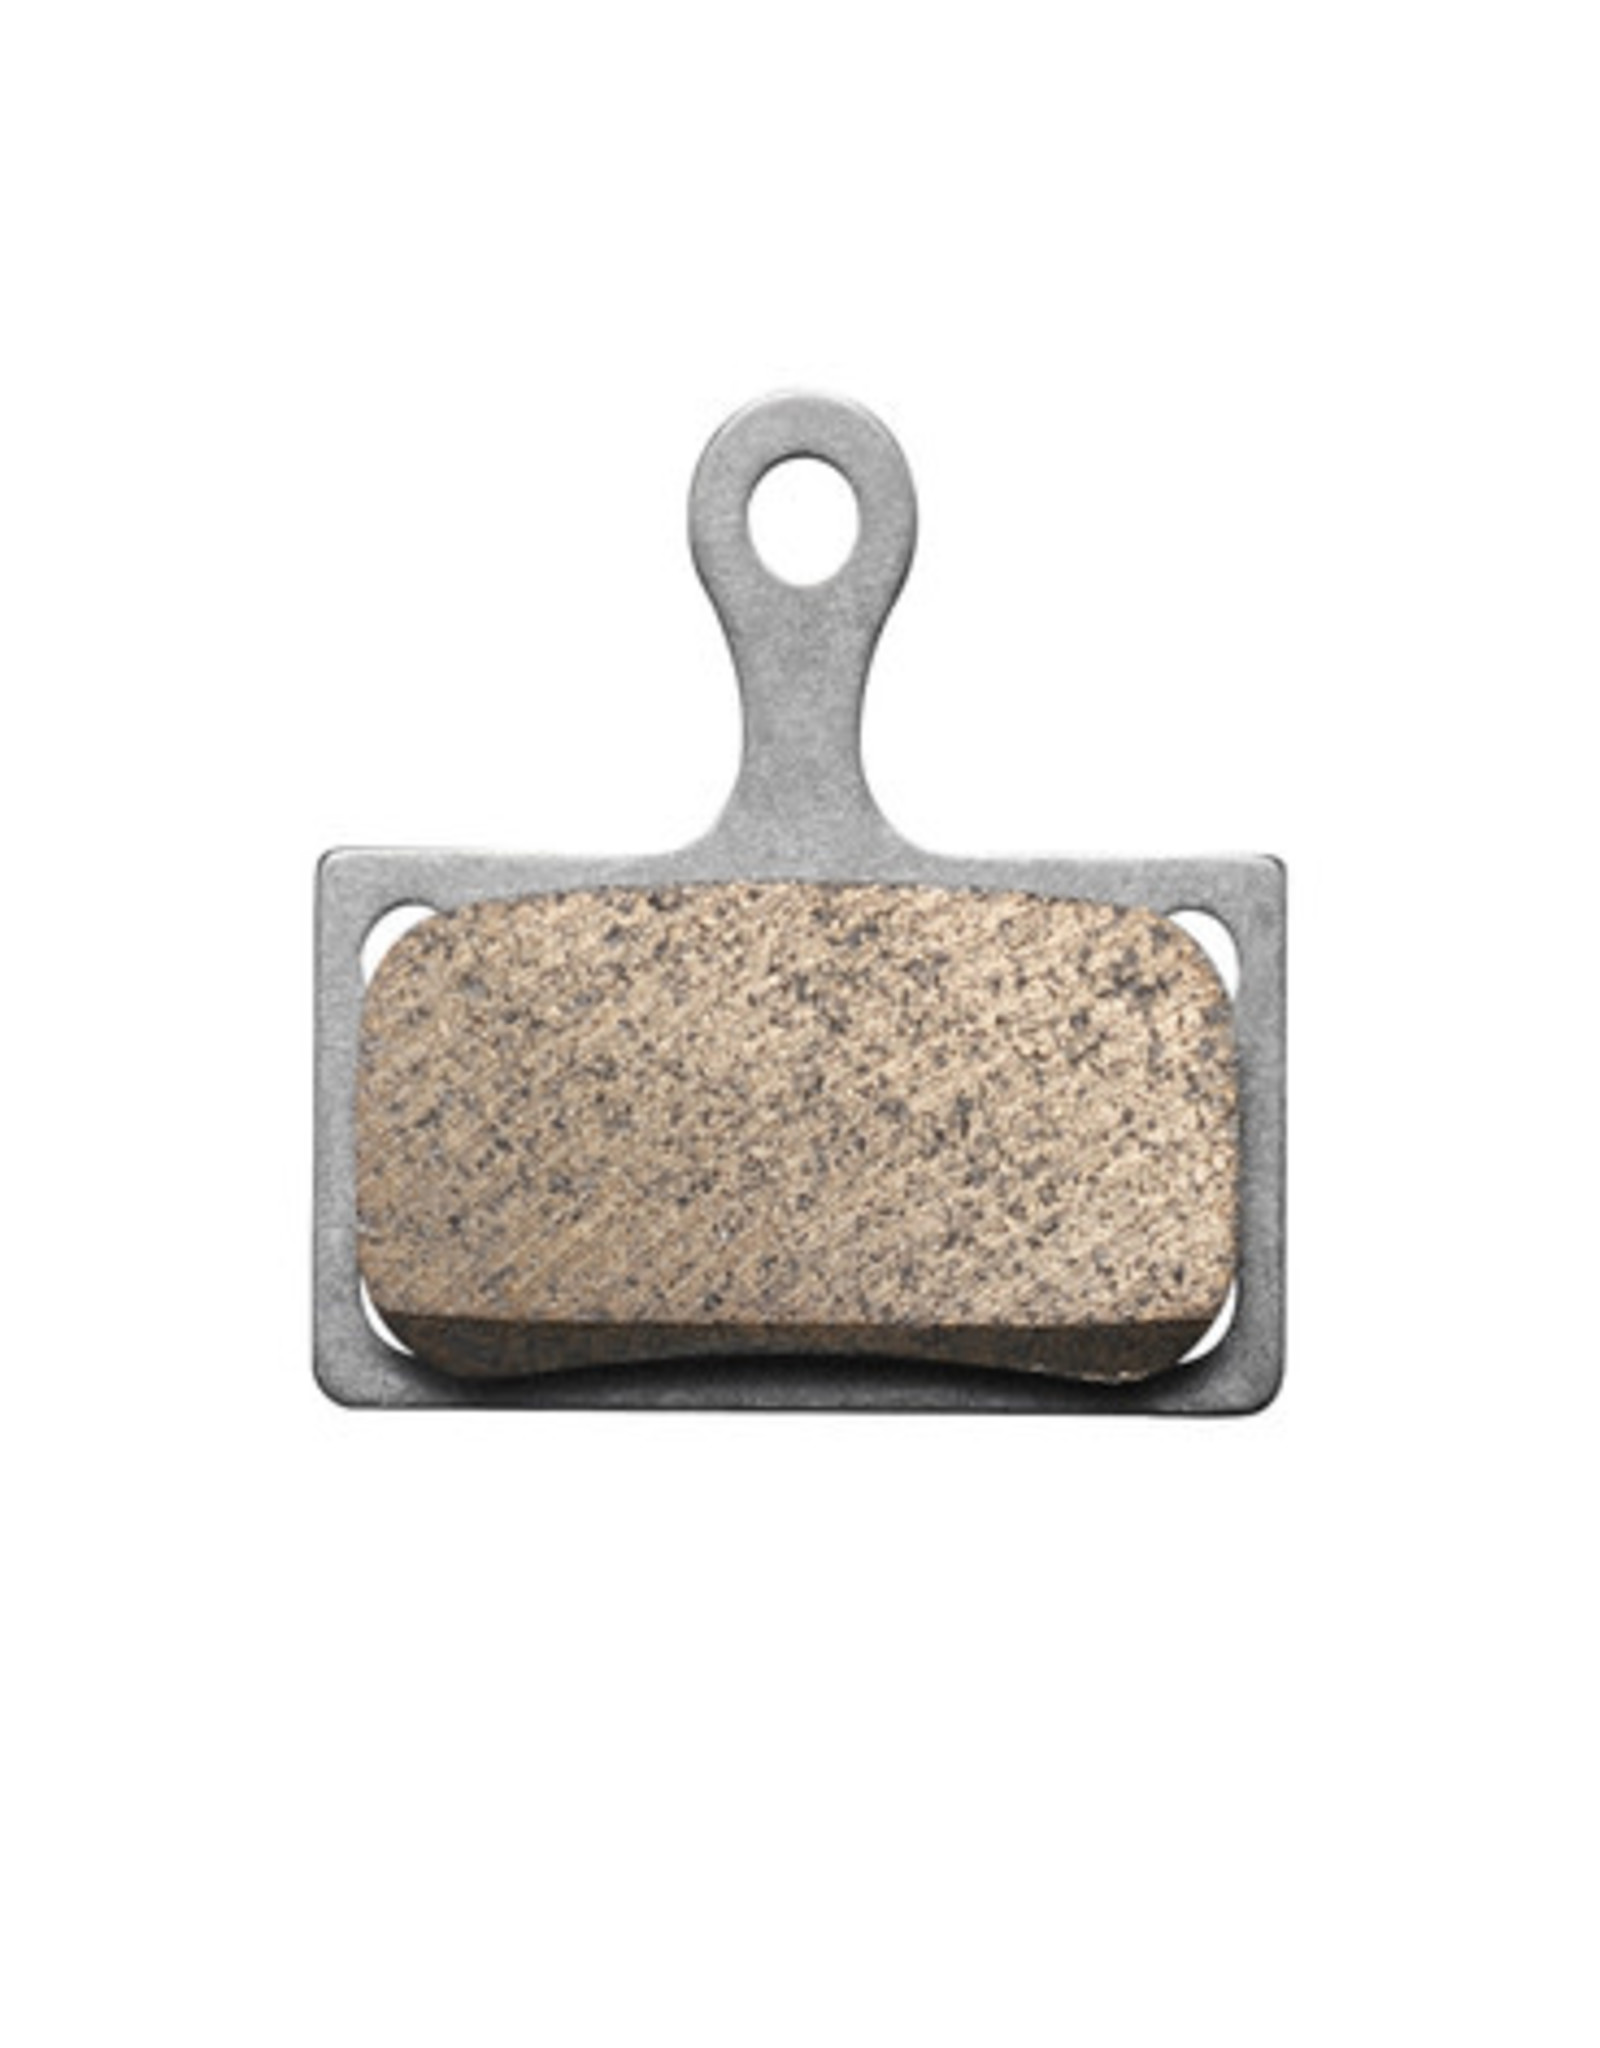 Shimano Plaquettes frein Shim G04Ti metal/titane (XT,SLX,Alfine 2 pist)